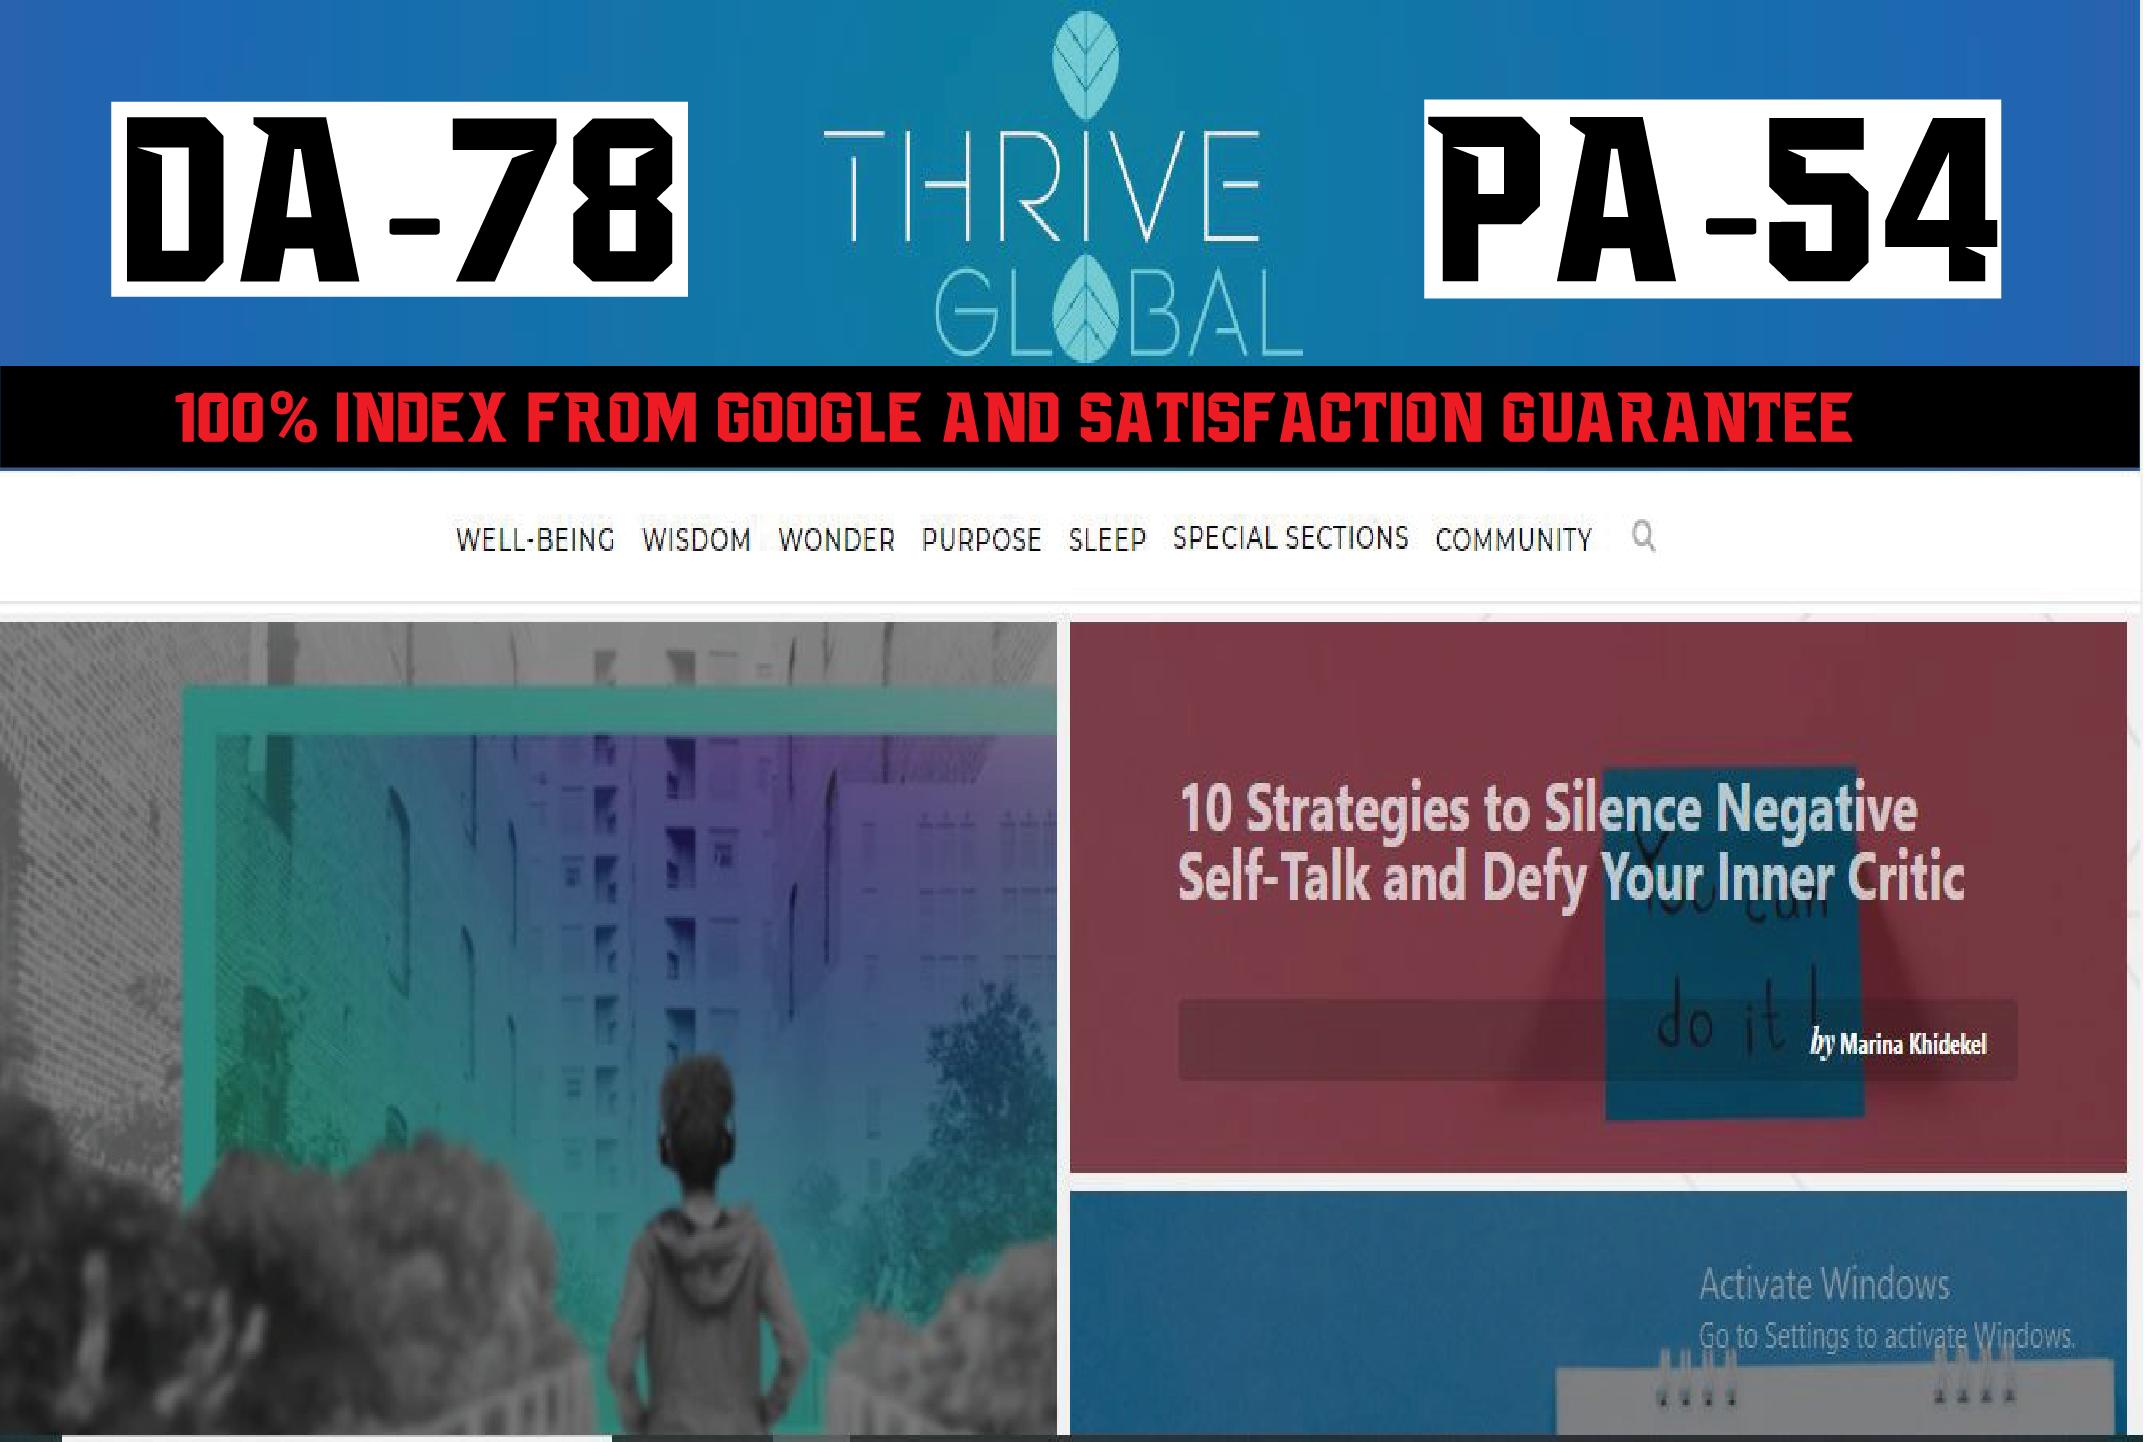 Premium Guest Post On Thriveglobal DA78 Blog